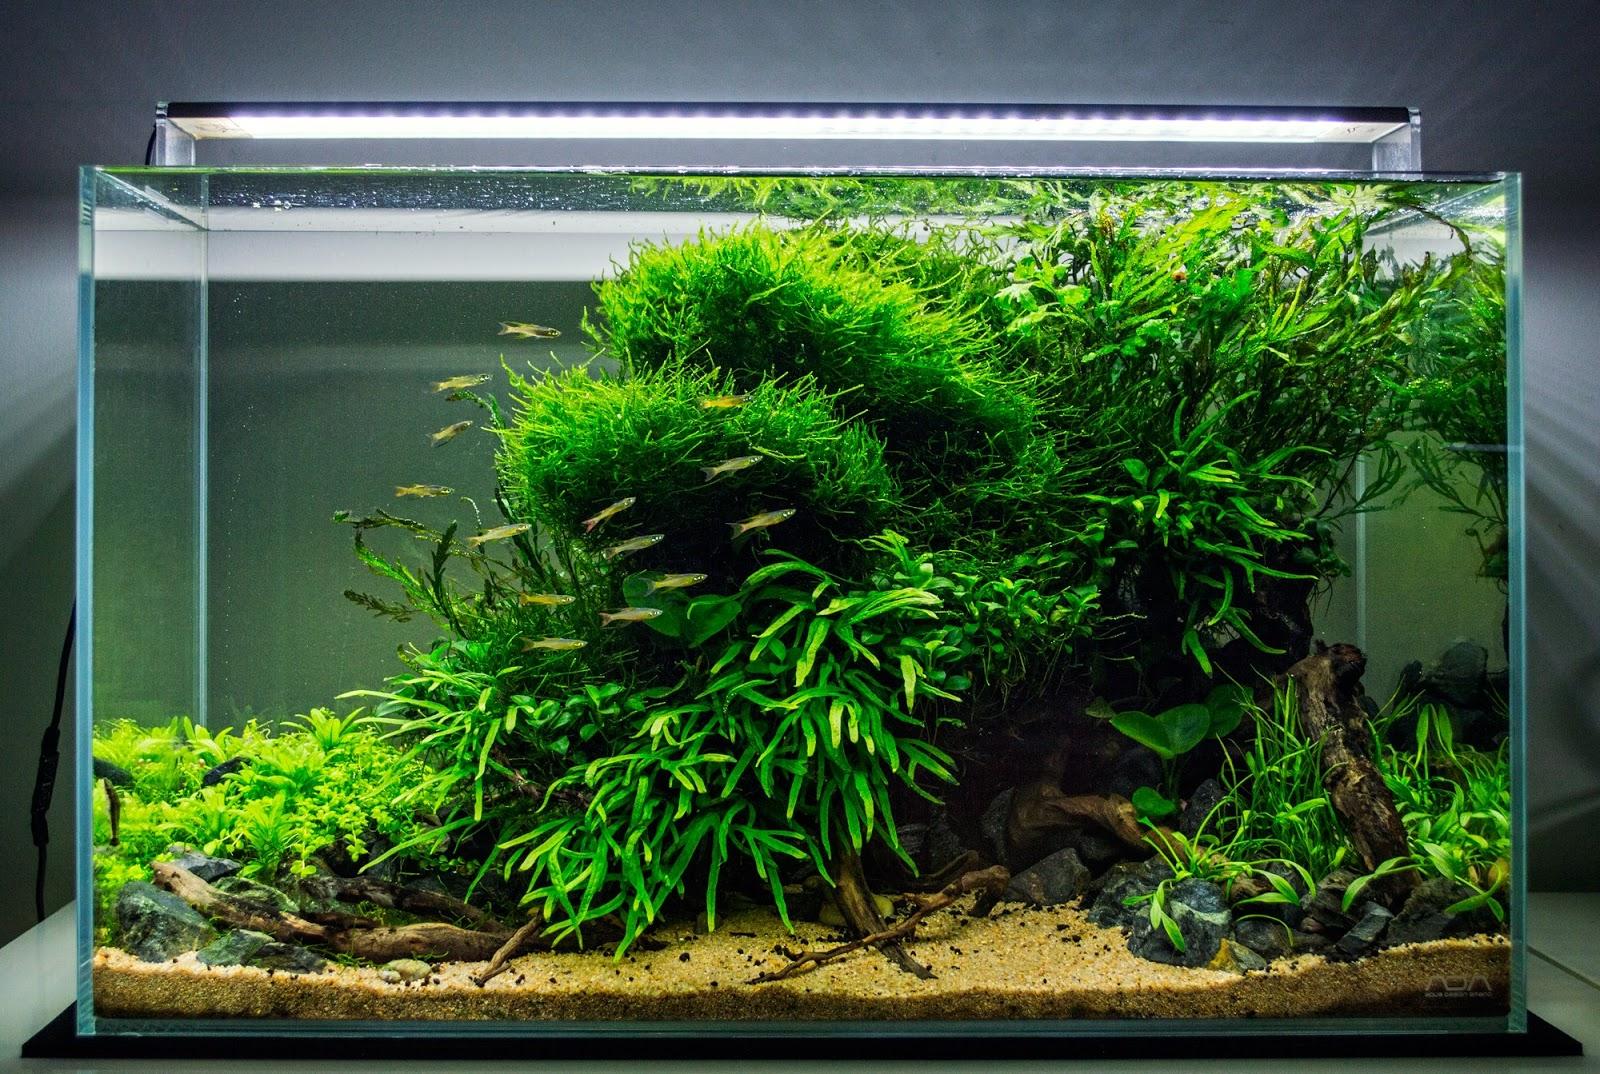 Hồ thủy sinh có cây dương xỉ Trident